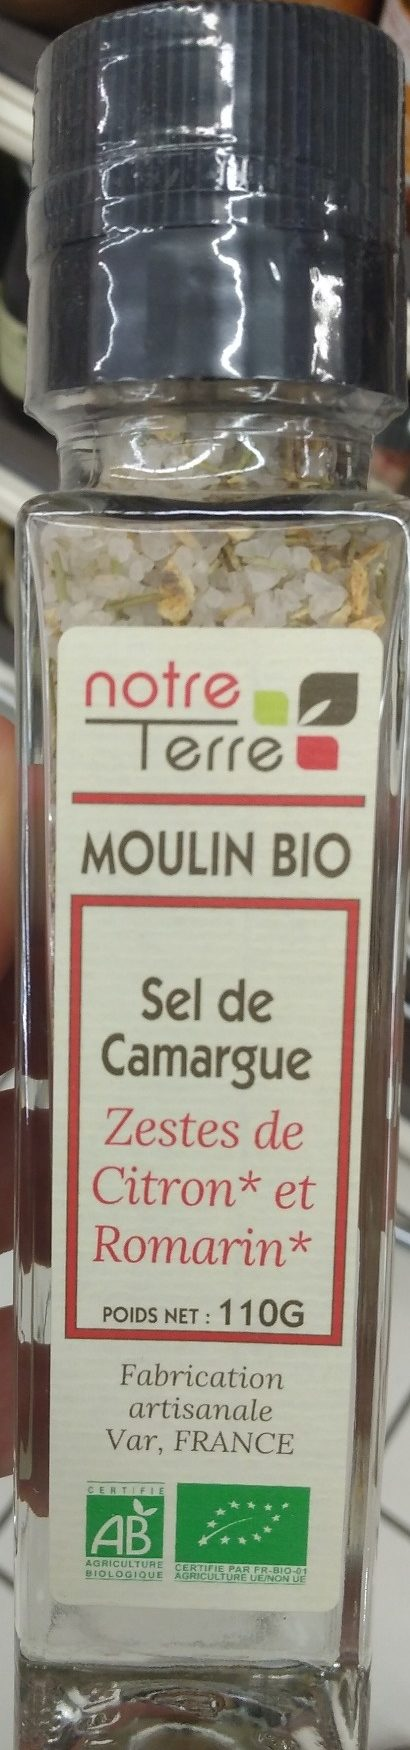 Sel de Camargue aeste de citron bio et de romarin bio - Product